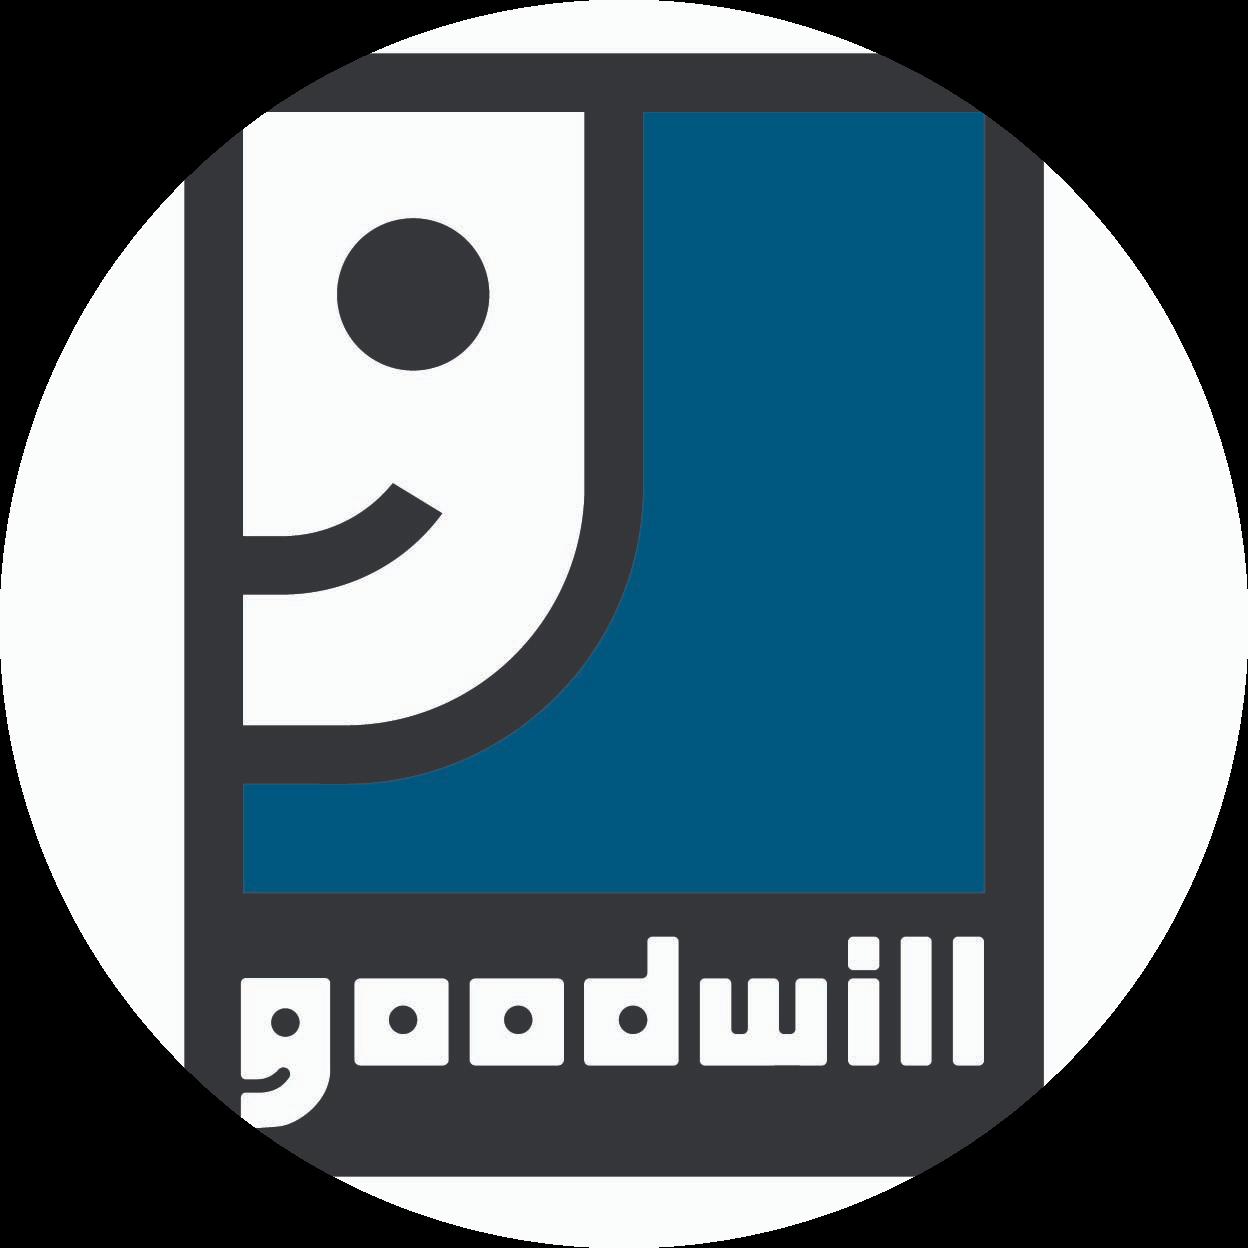 @goodwillwa Profile Image | Linktree